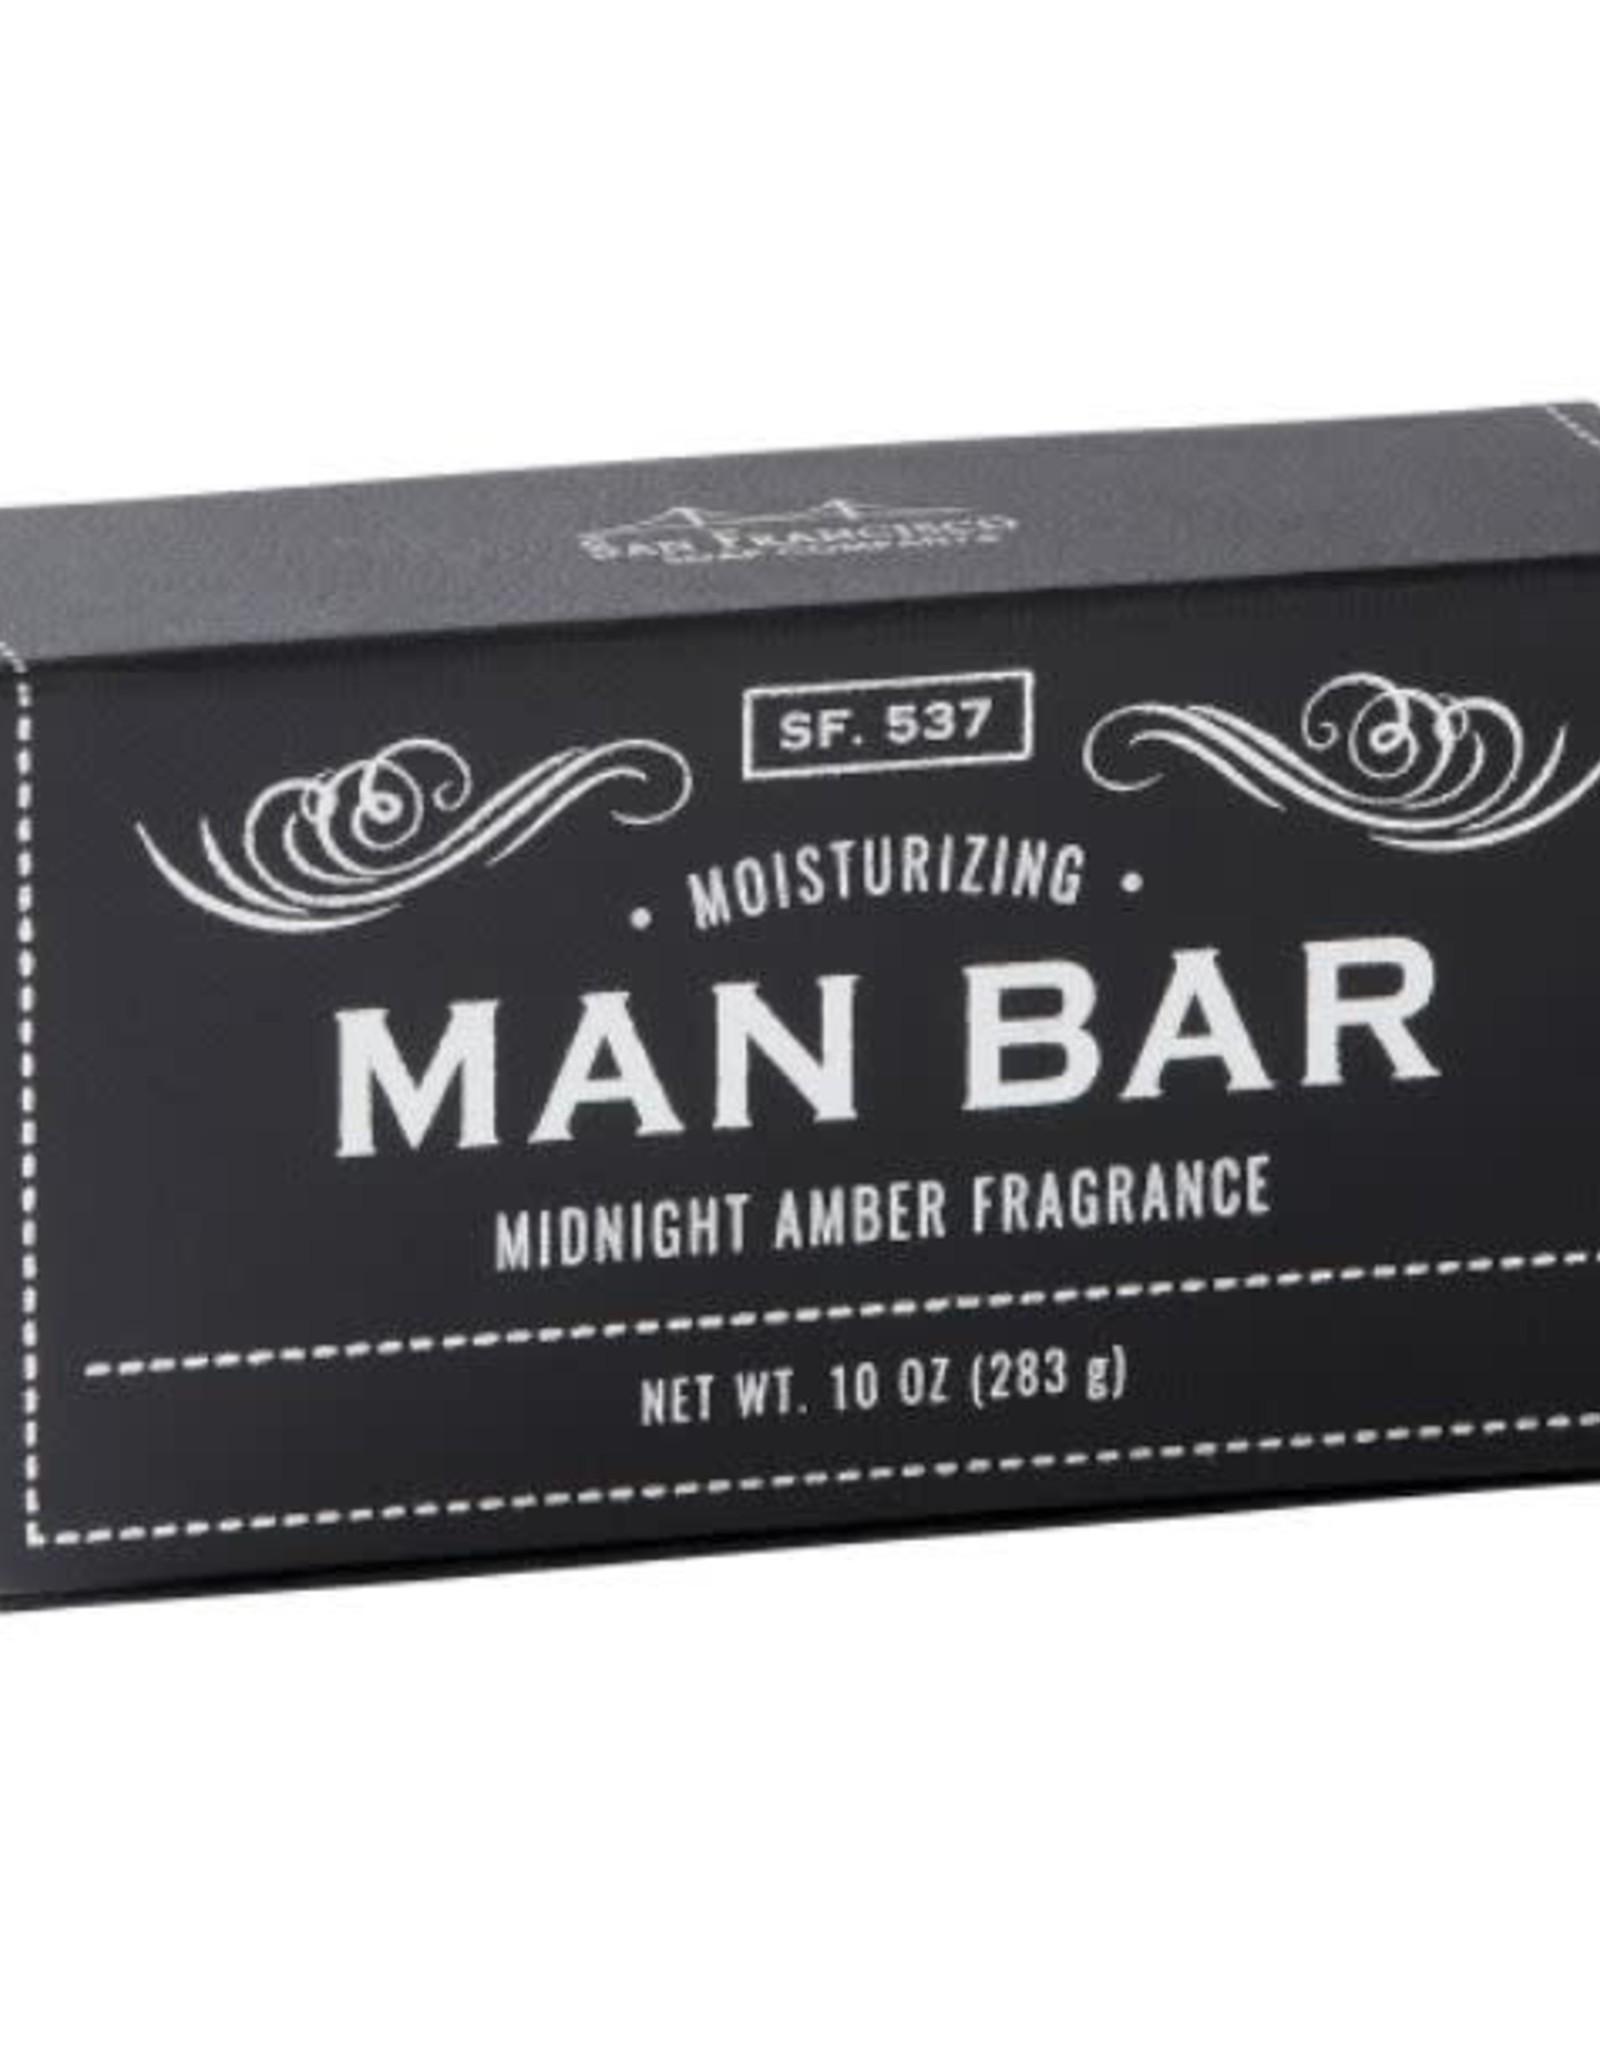 SAN FRANCISCO SOAP COMPANY MAN BAR SOAP BAR